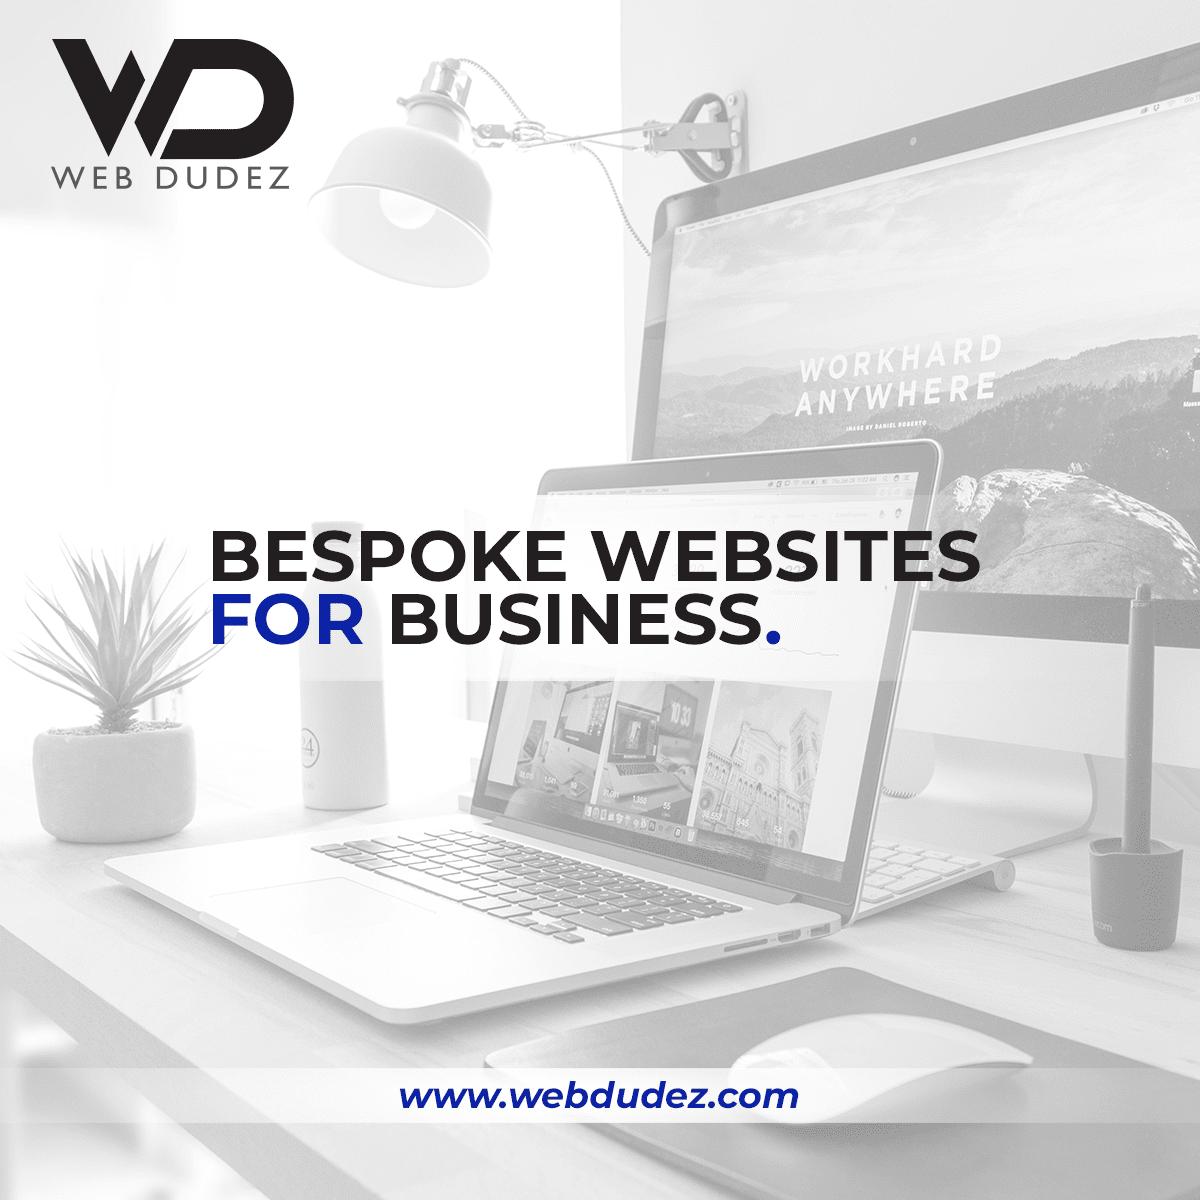 https://bbhub.eu/Web Dudez - Bespoke websites and e-commerce